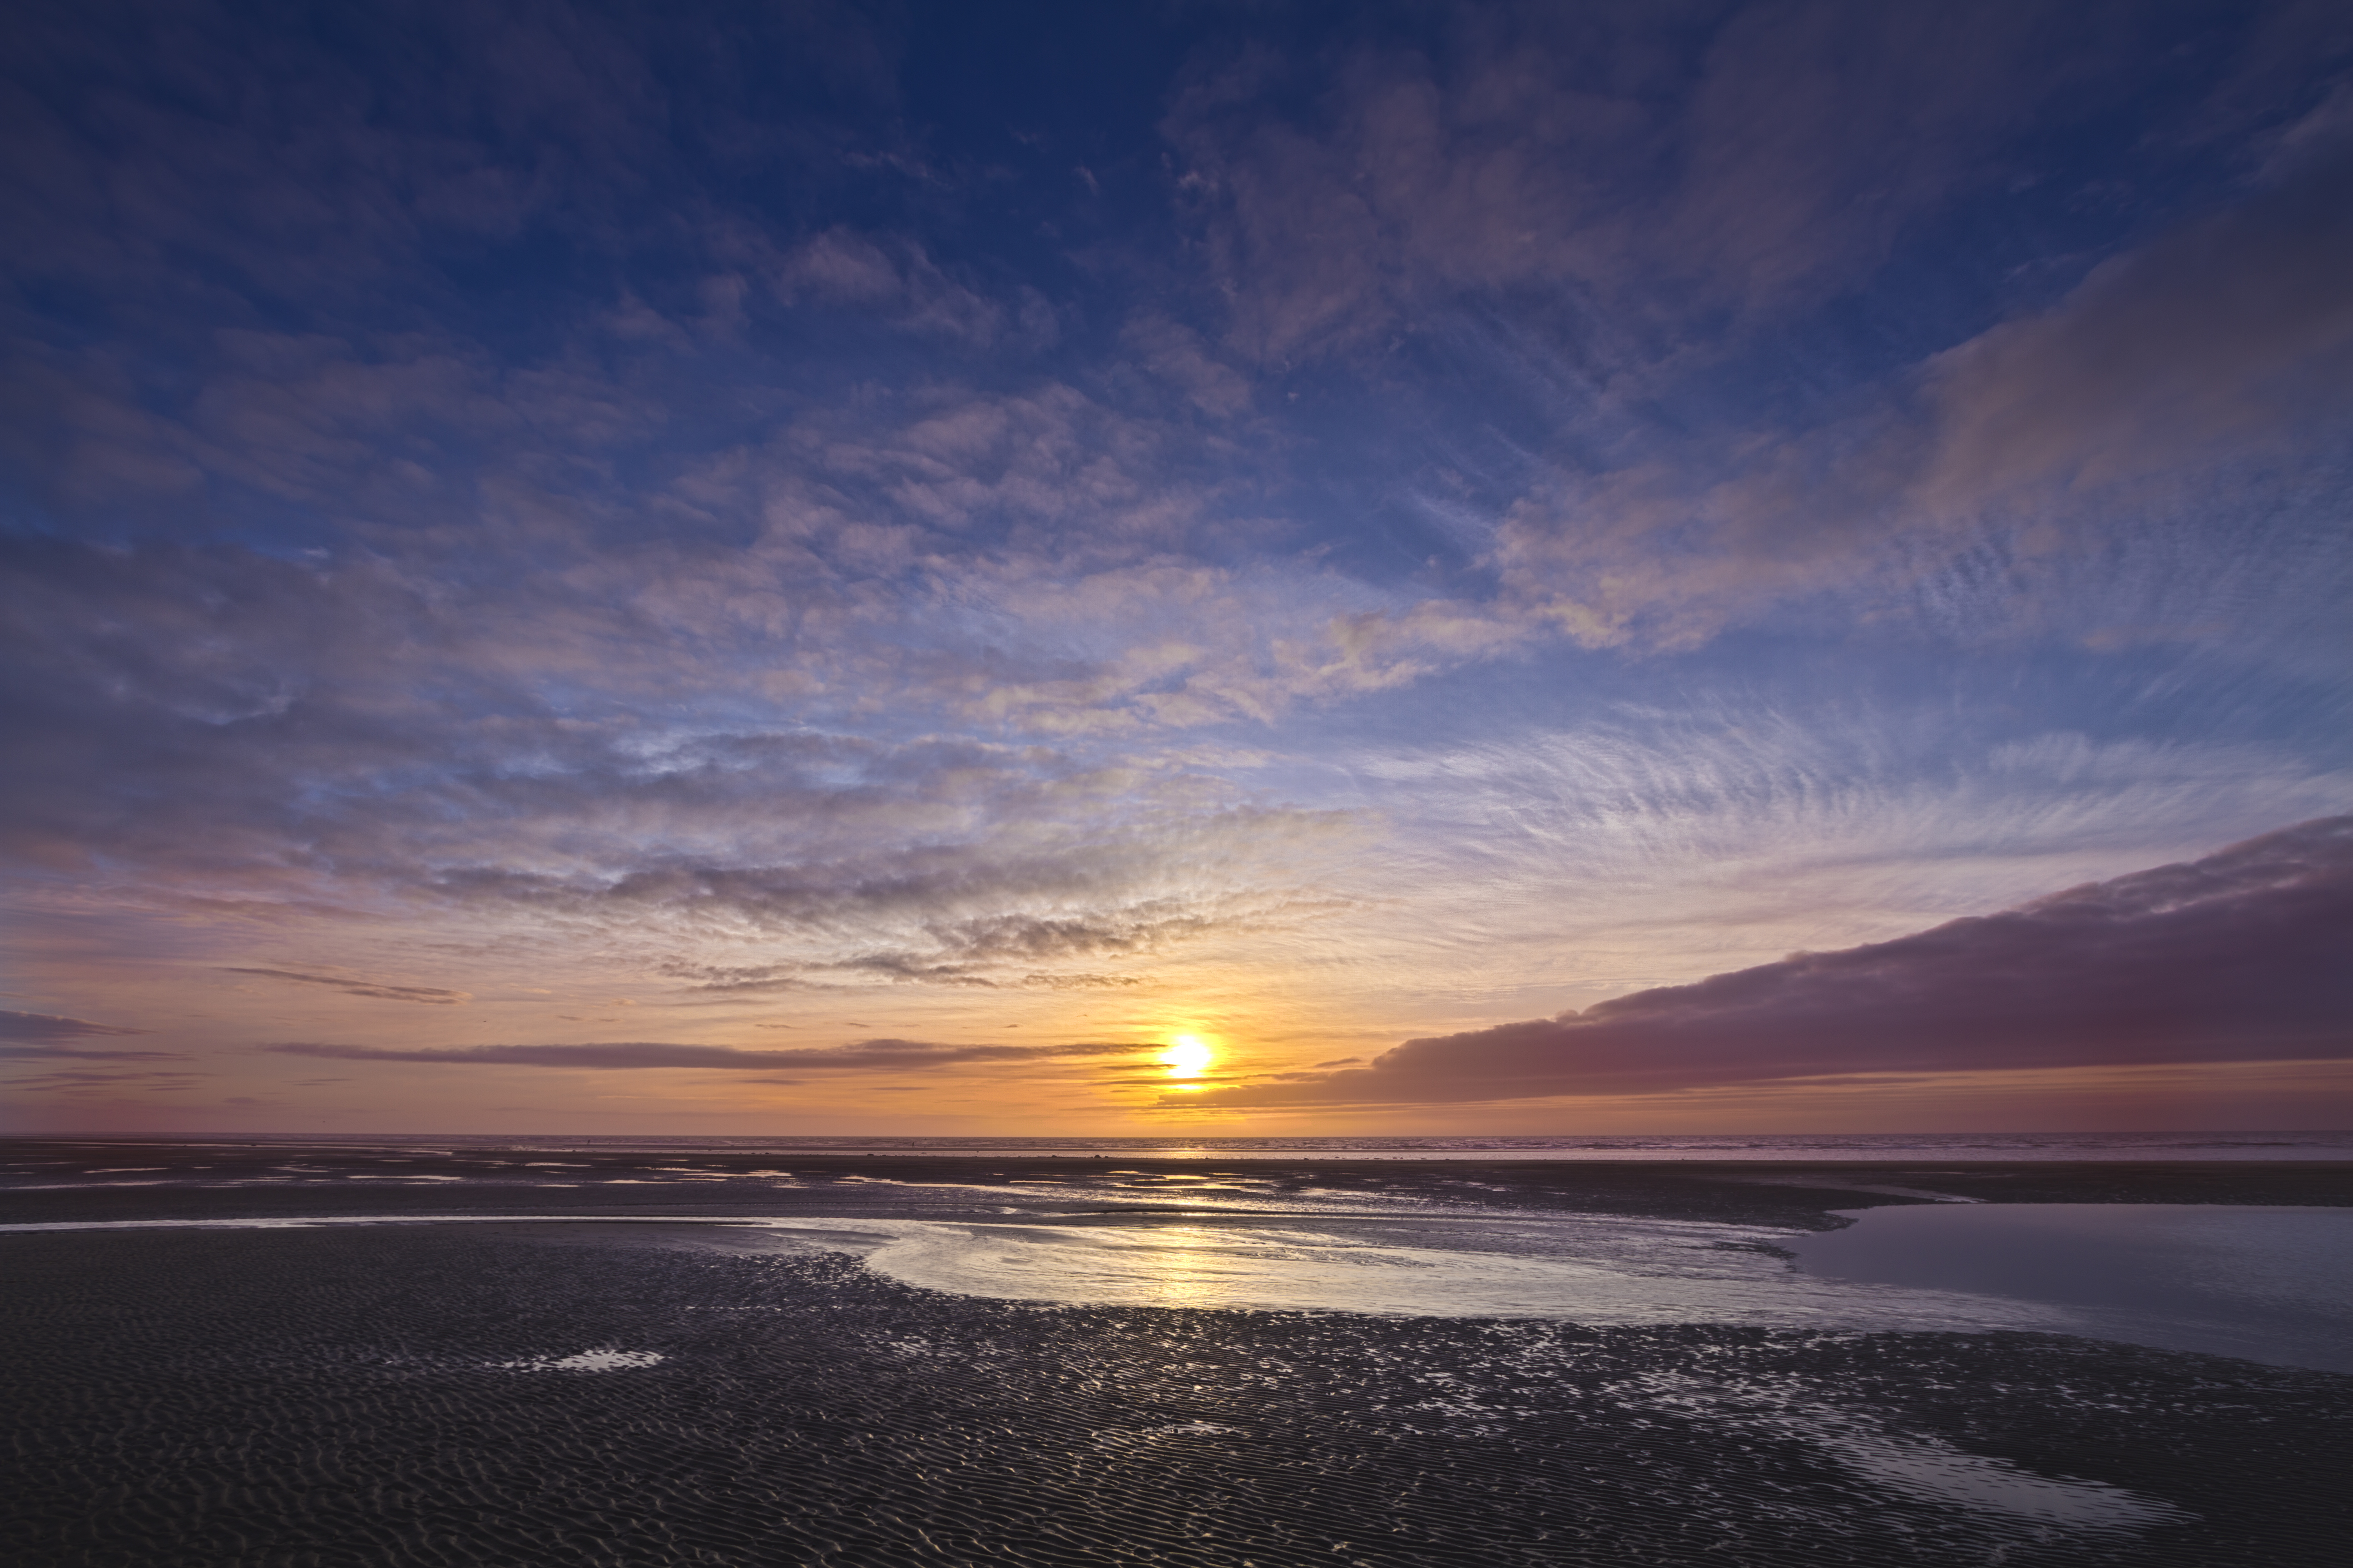 Cleveleys beach sunset photo